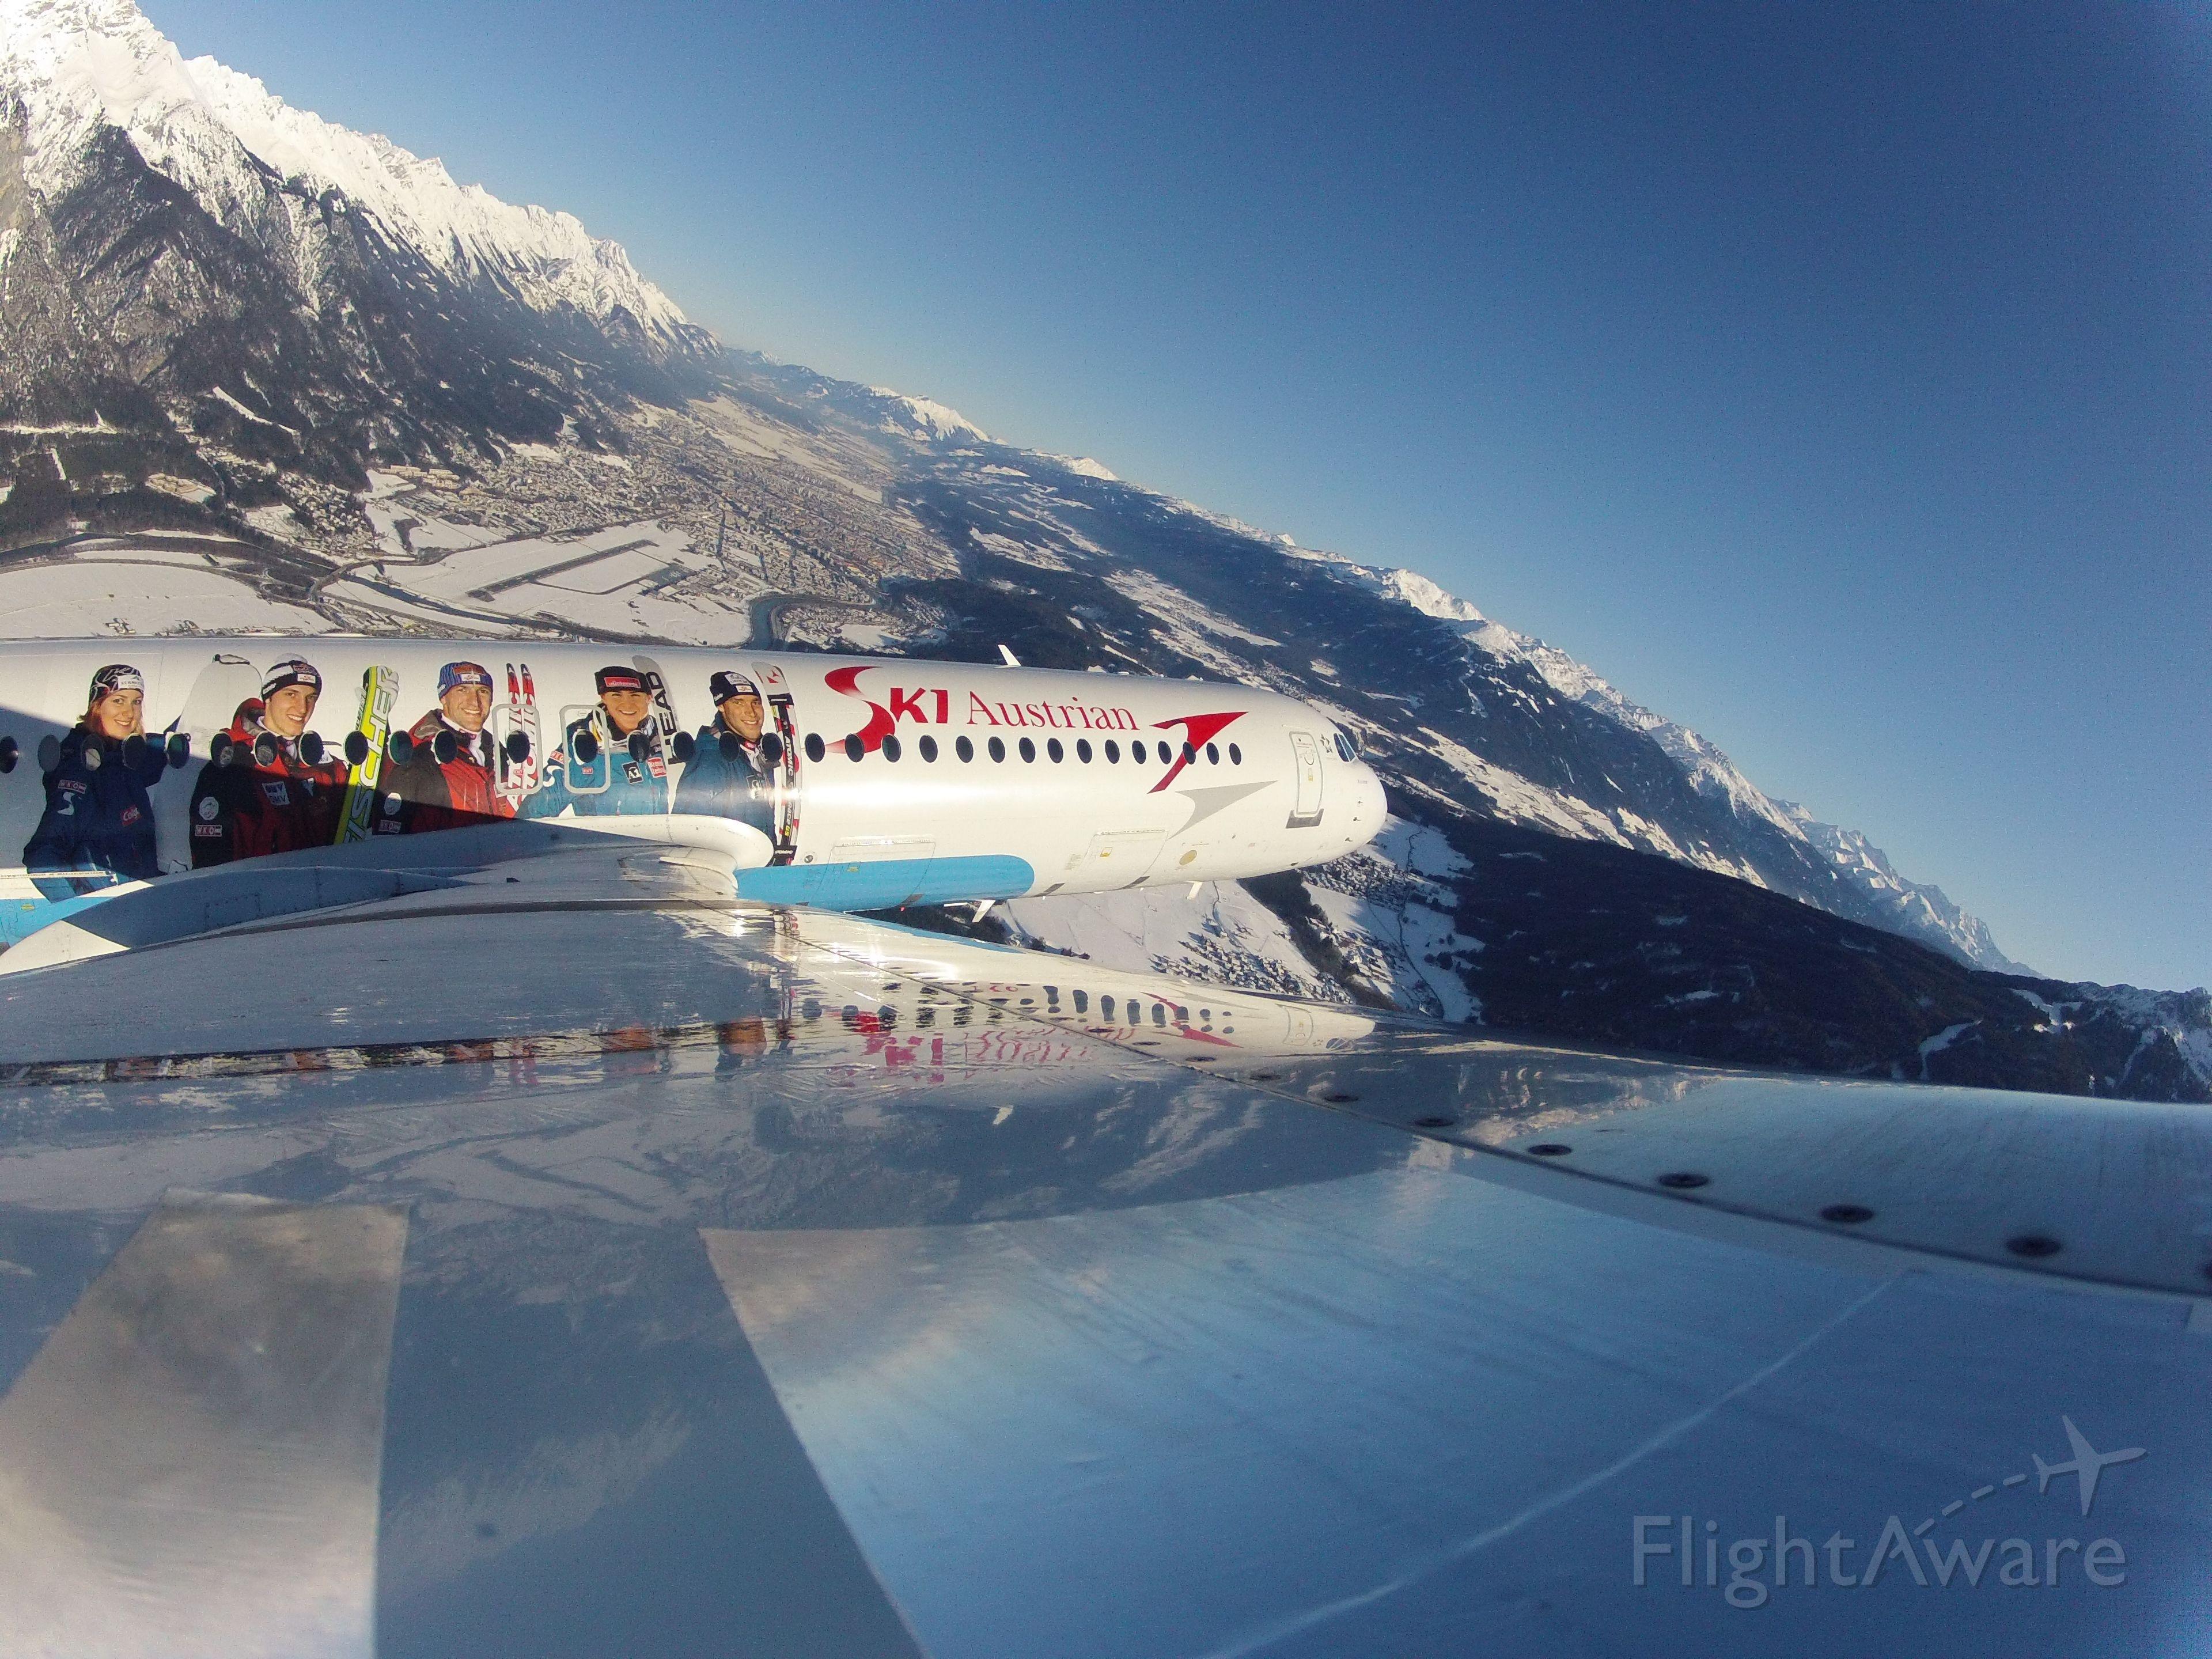 Fokker 100 (OE-LVM) - PR-flight for the Austrian Skiing Federation, no PAX, just departed runway 26 below